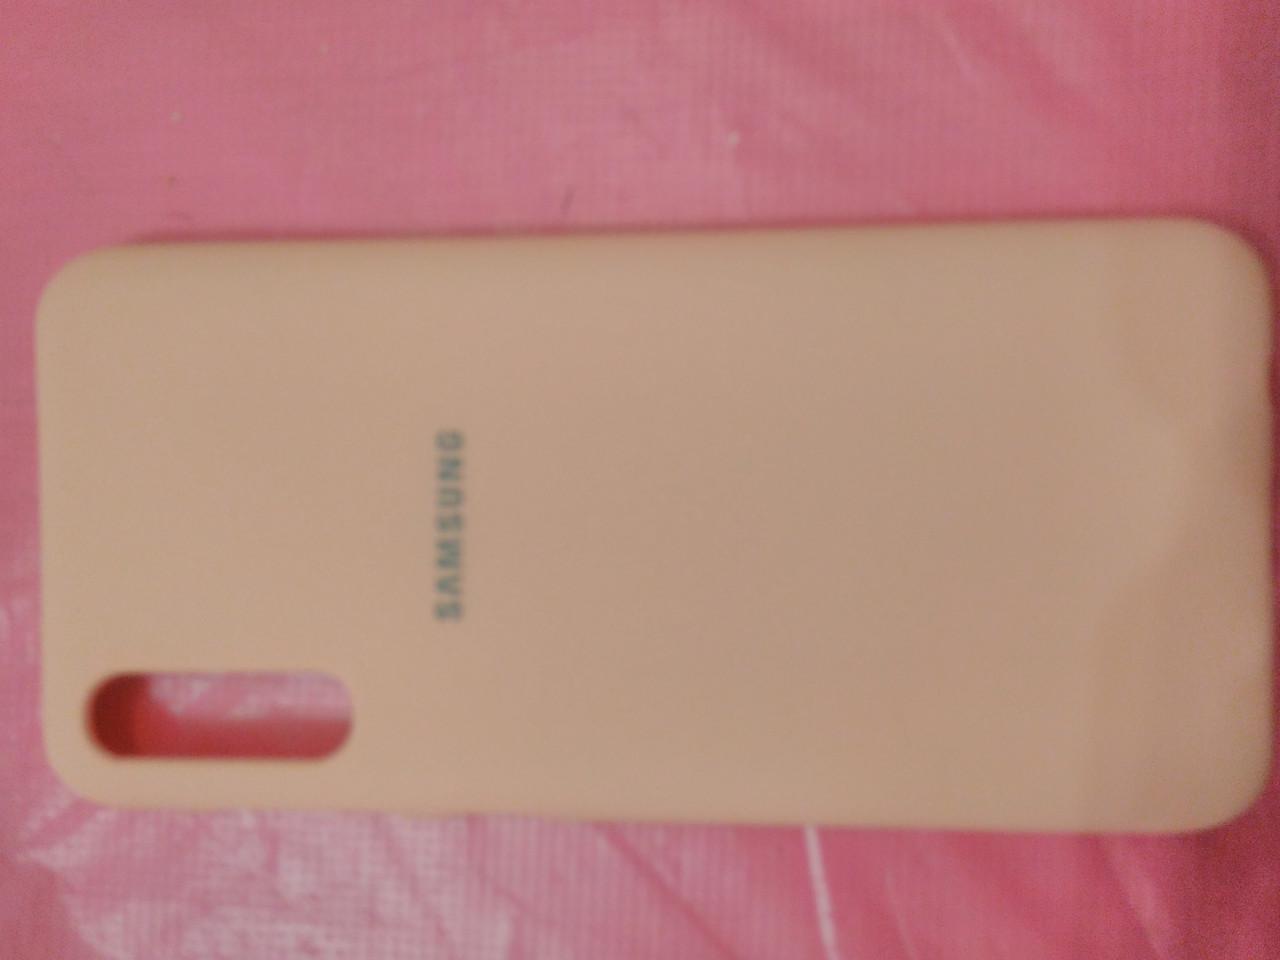 Накладка   Silicon Cover full   для  Samsung A 50  2019 //  A30s  (розовый)